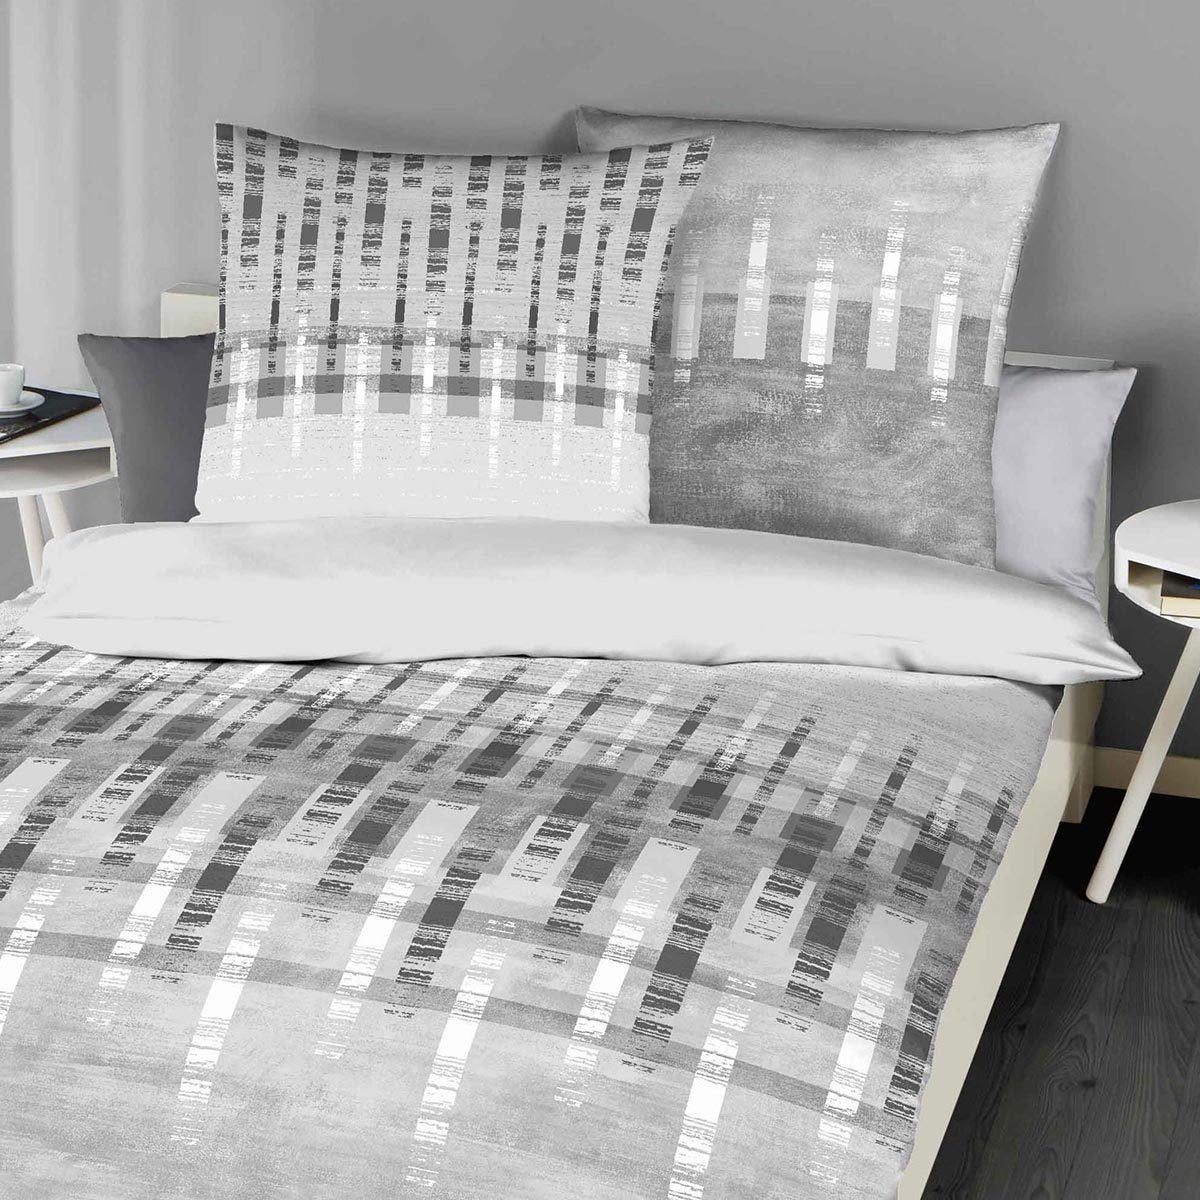 kaeppel biber bettw sche relate grau g nstig online kaufen bei bettwaren shop. Black Bedroom Furniture Sets. Home Design Ideas